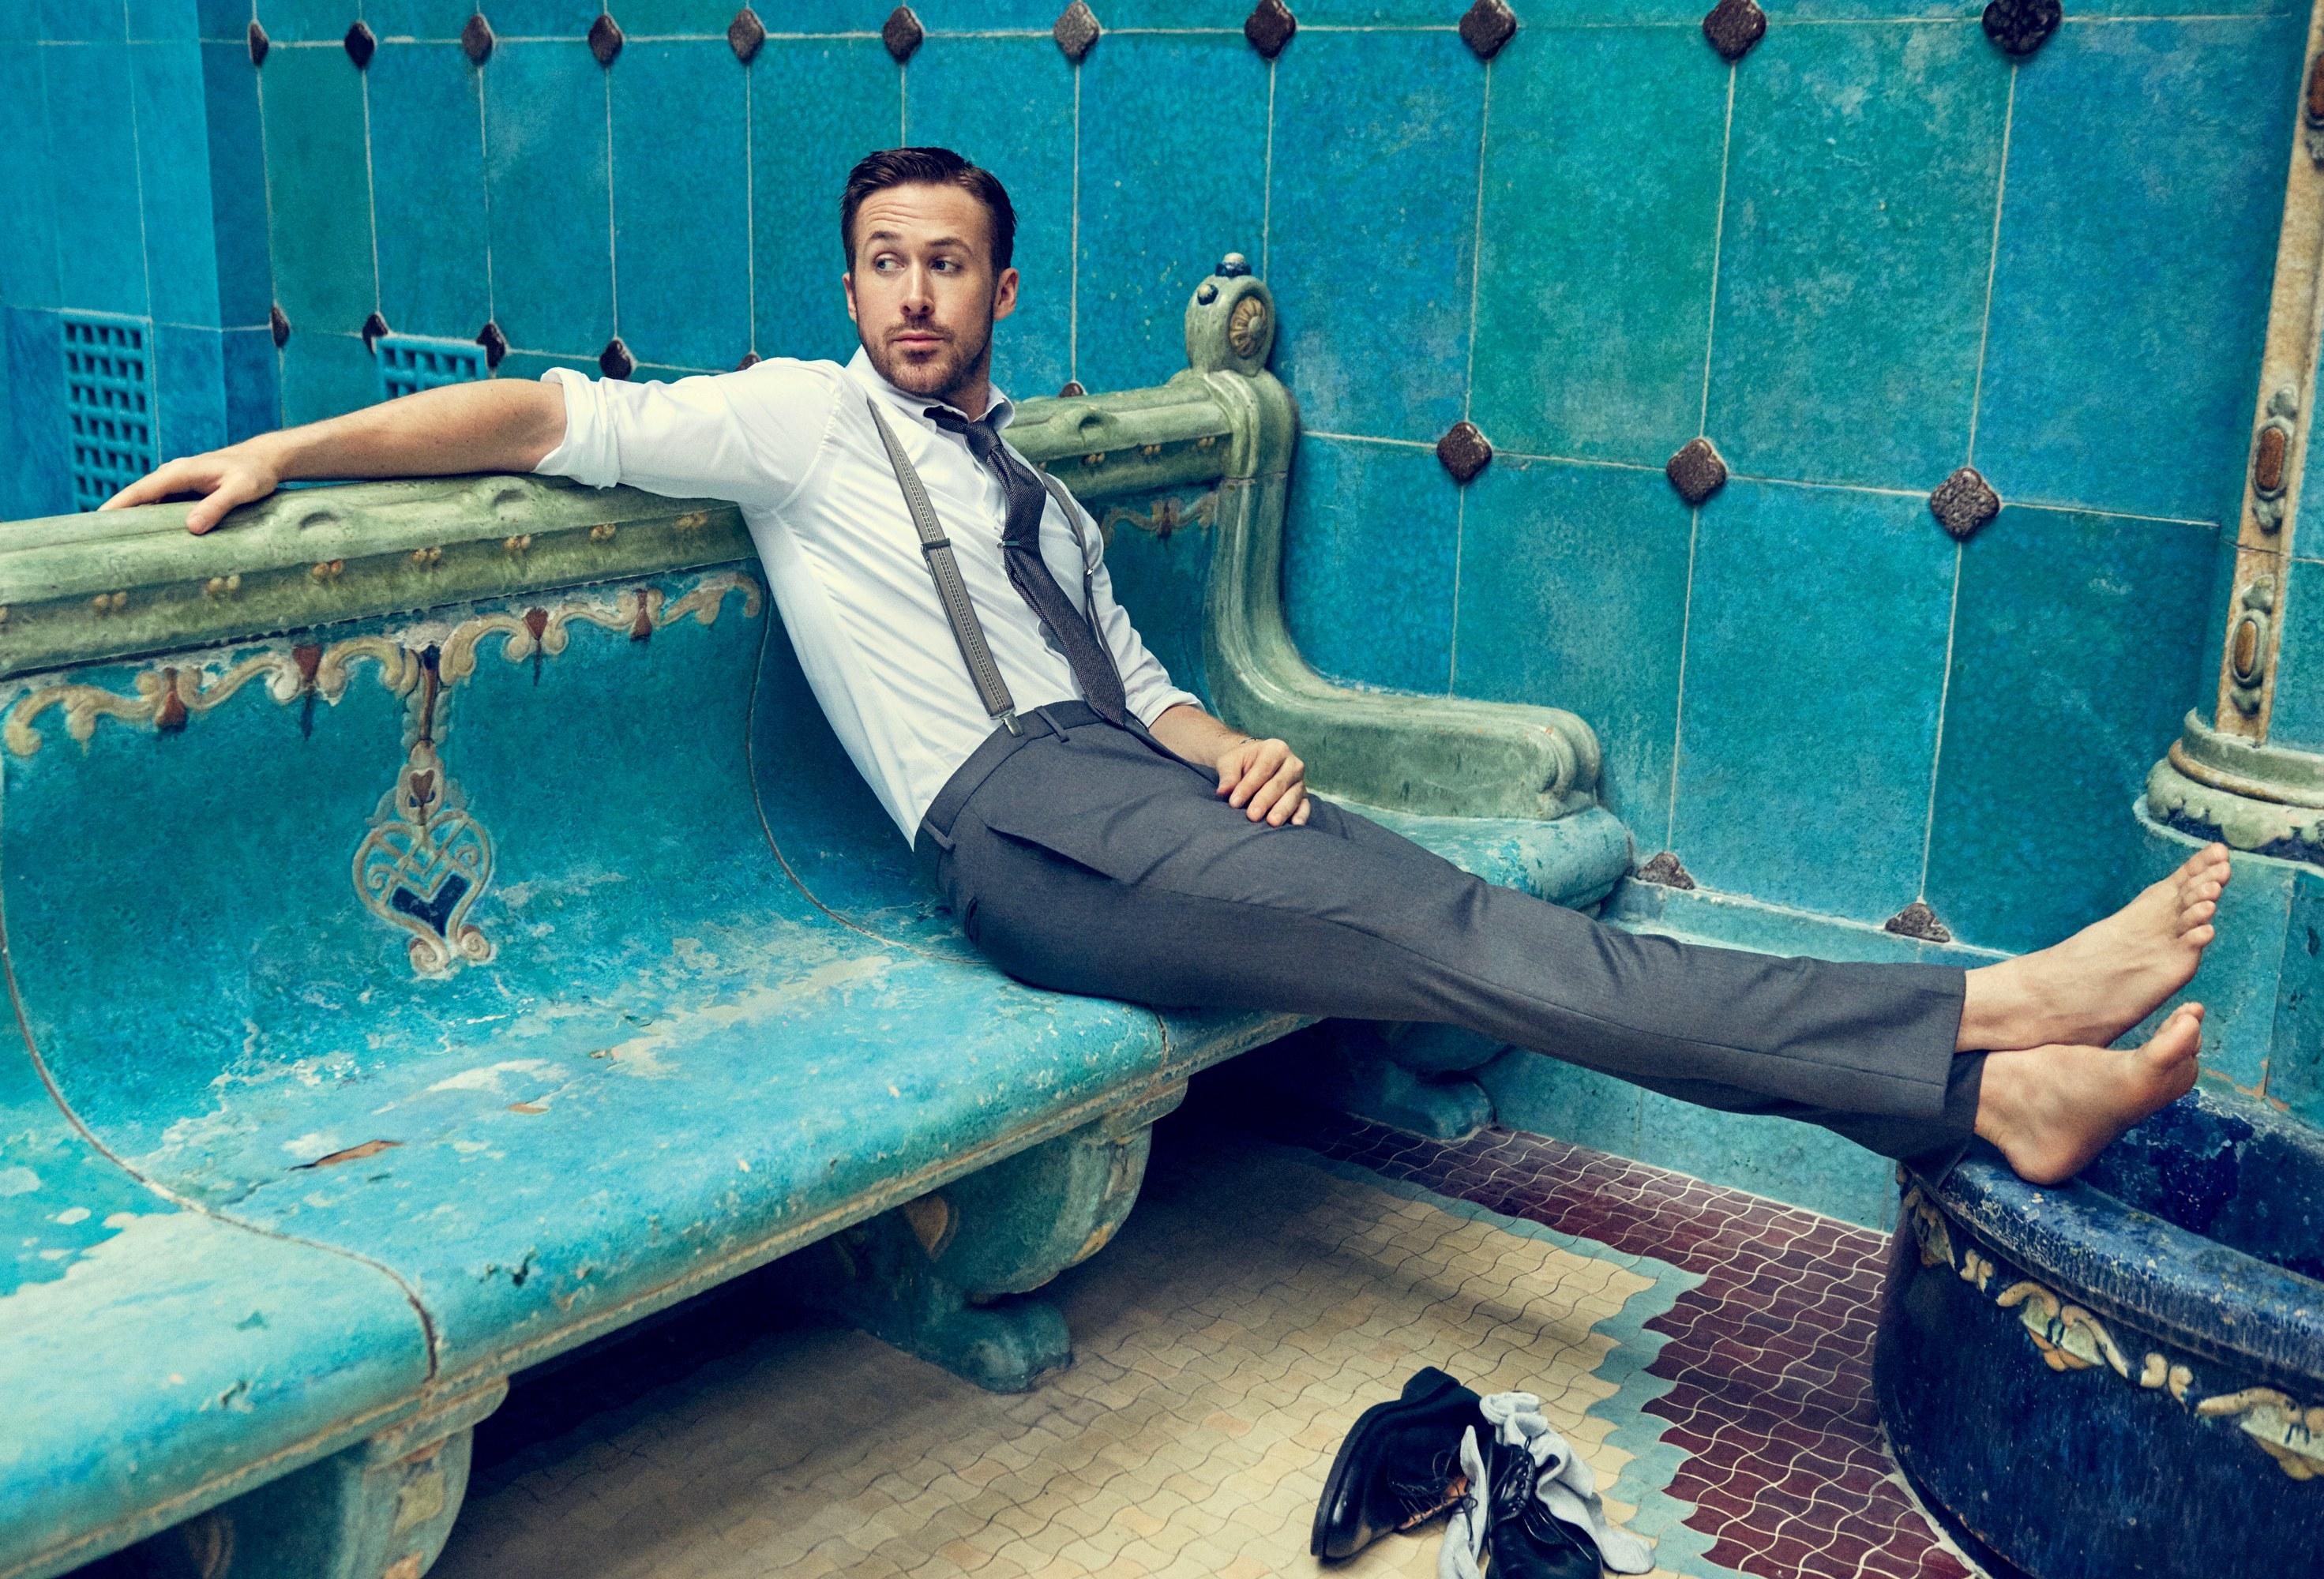 Harrison Ford le propinó un puñetazo a Ryan Gosling